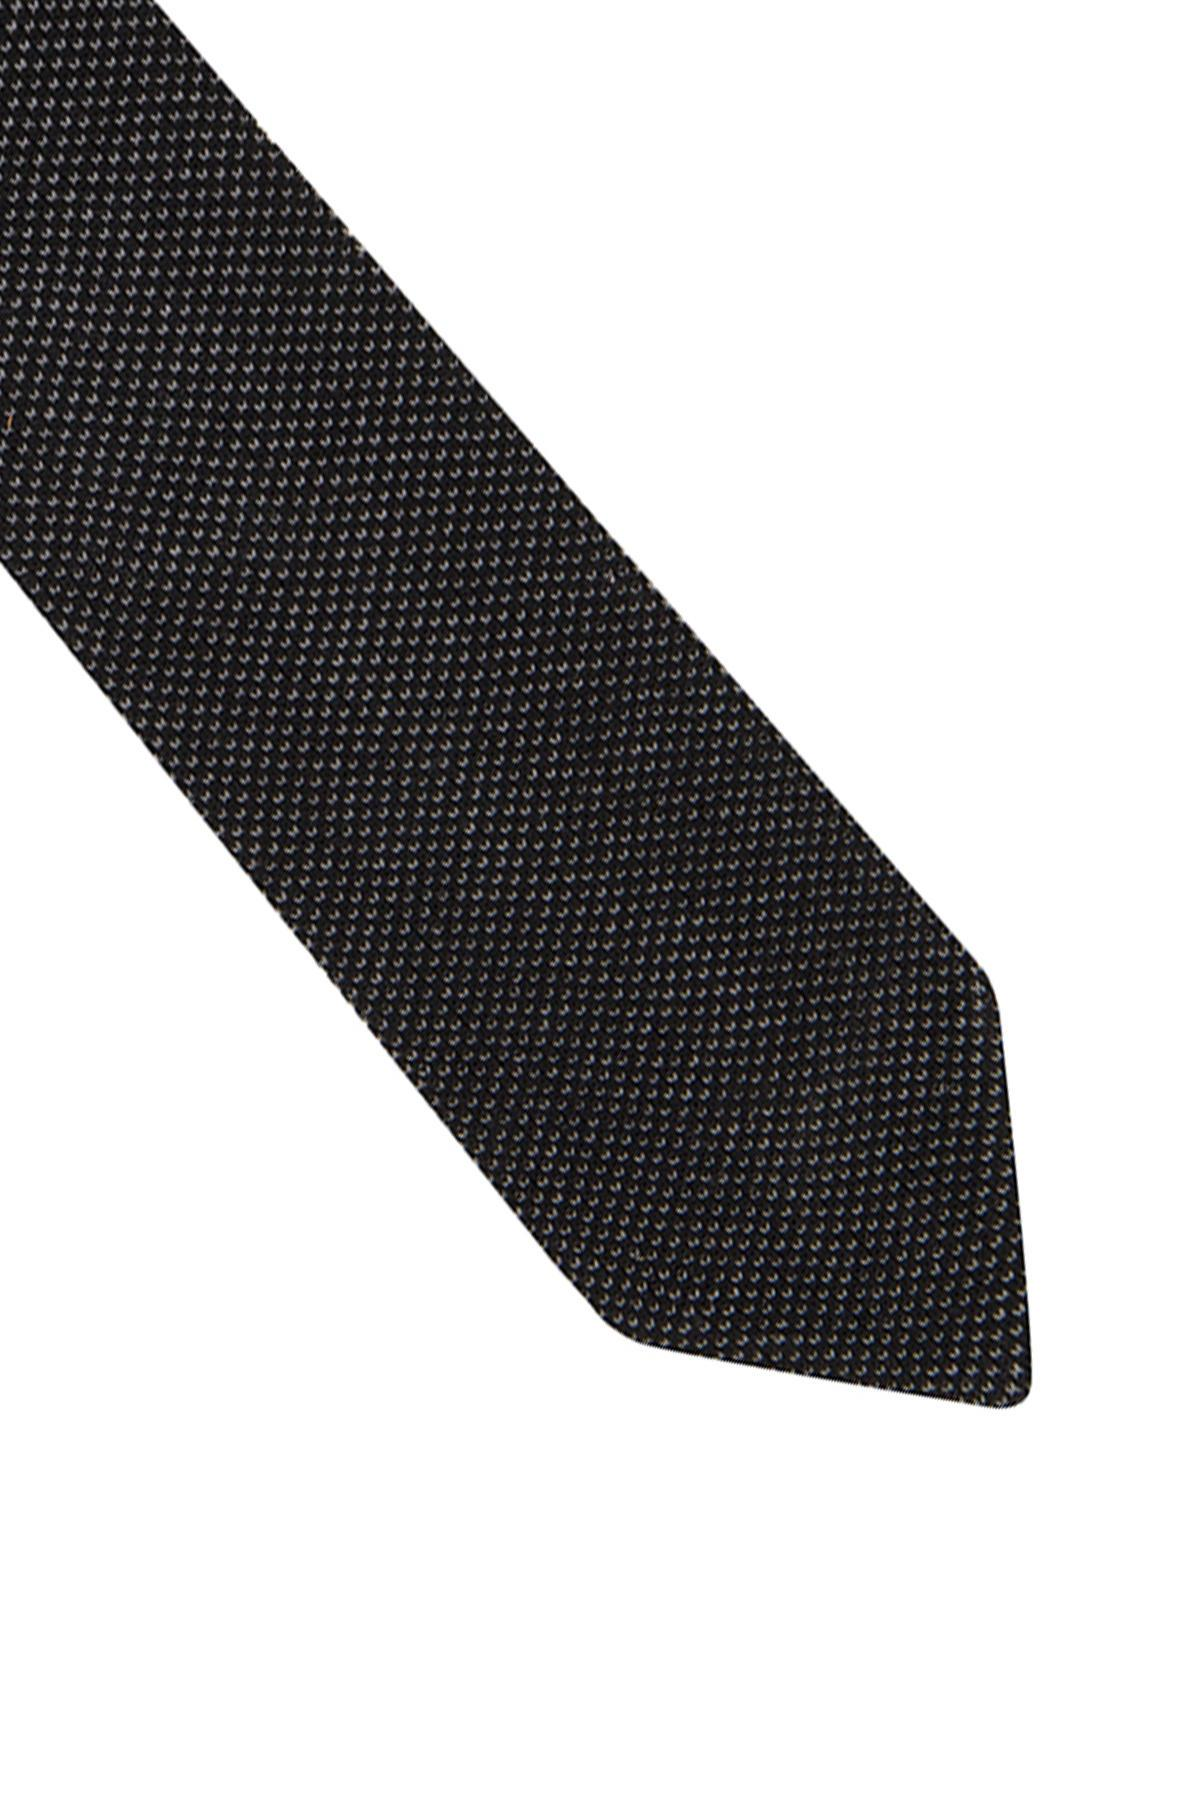 Siyah Gri Mikro Desen Örgü Kravat